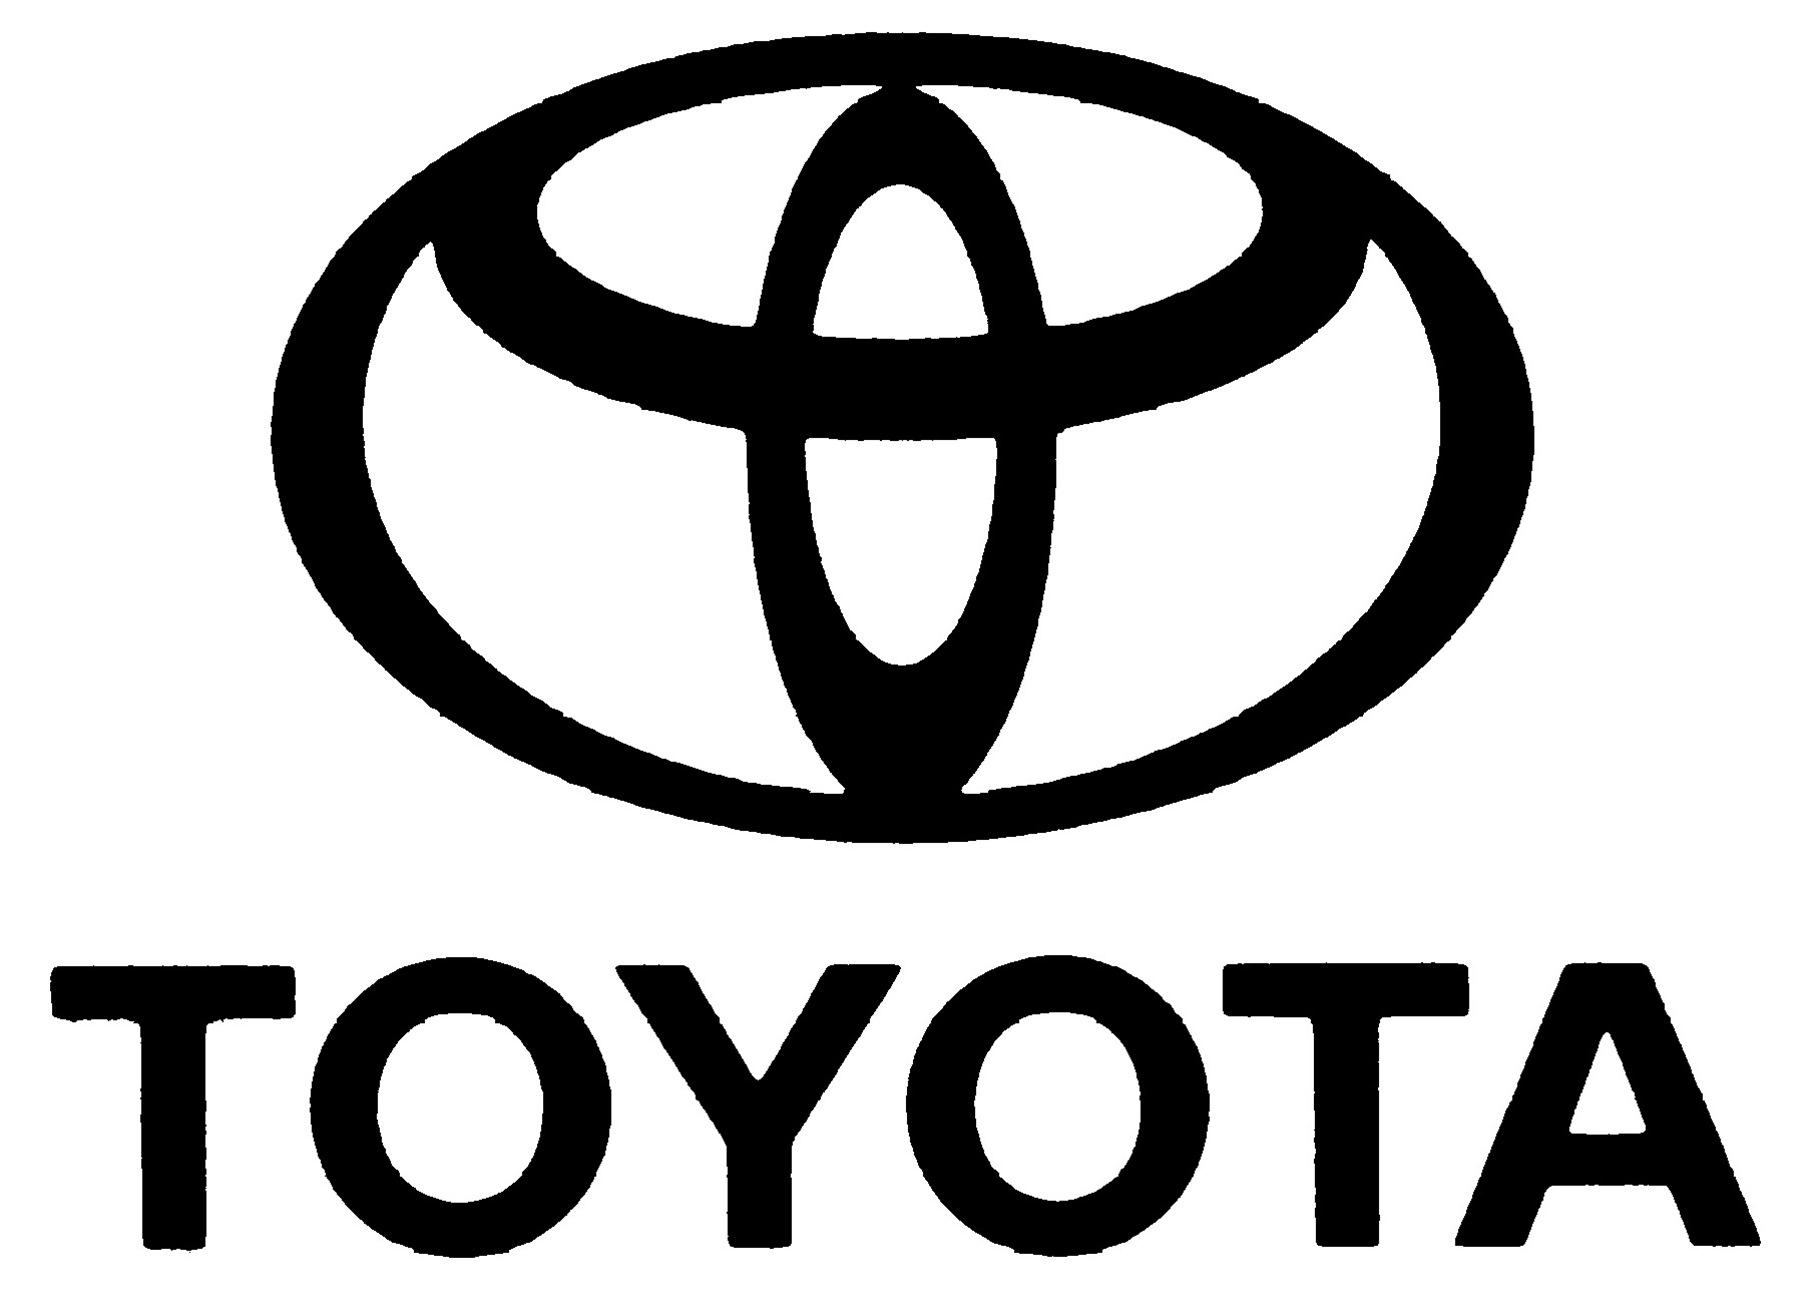 toyota-logo-vector.jpg